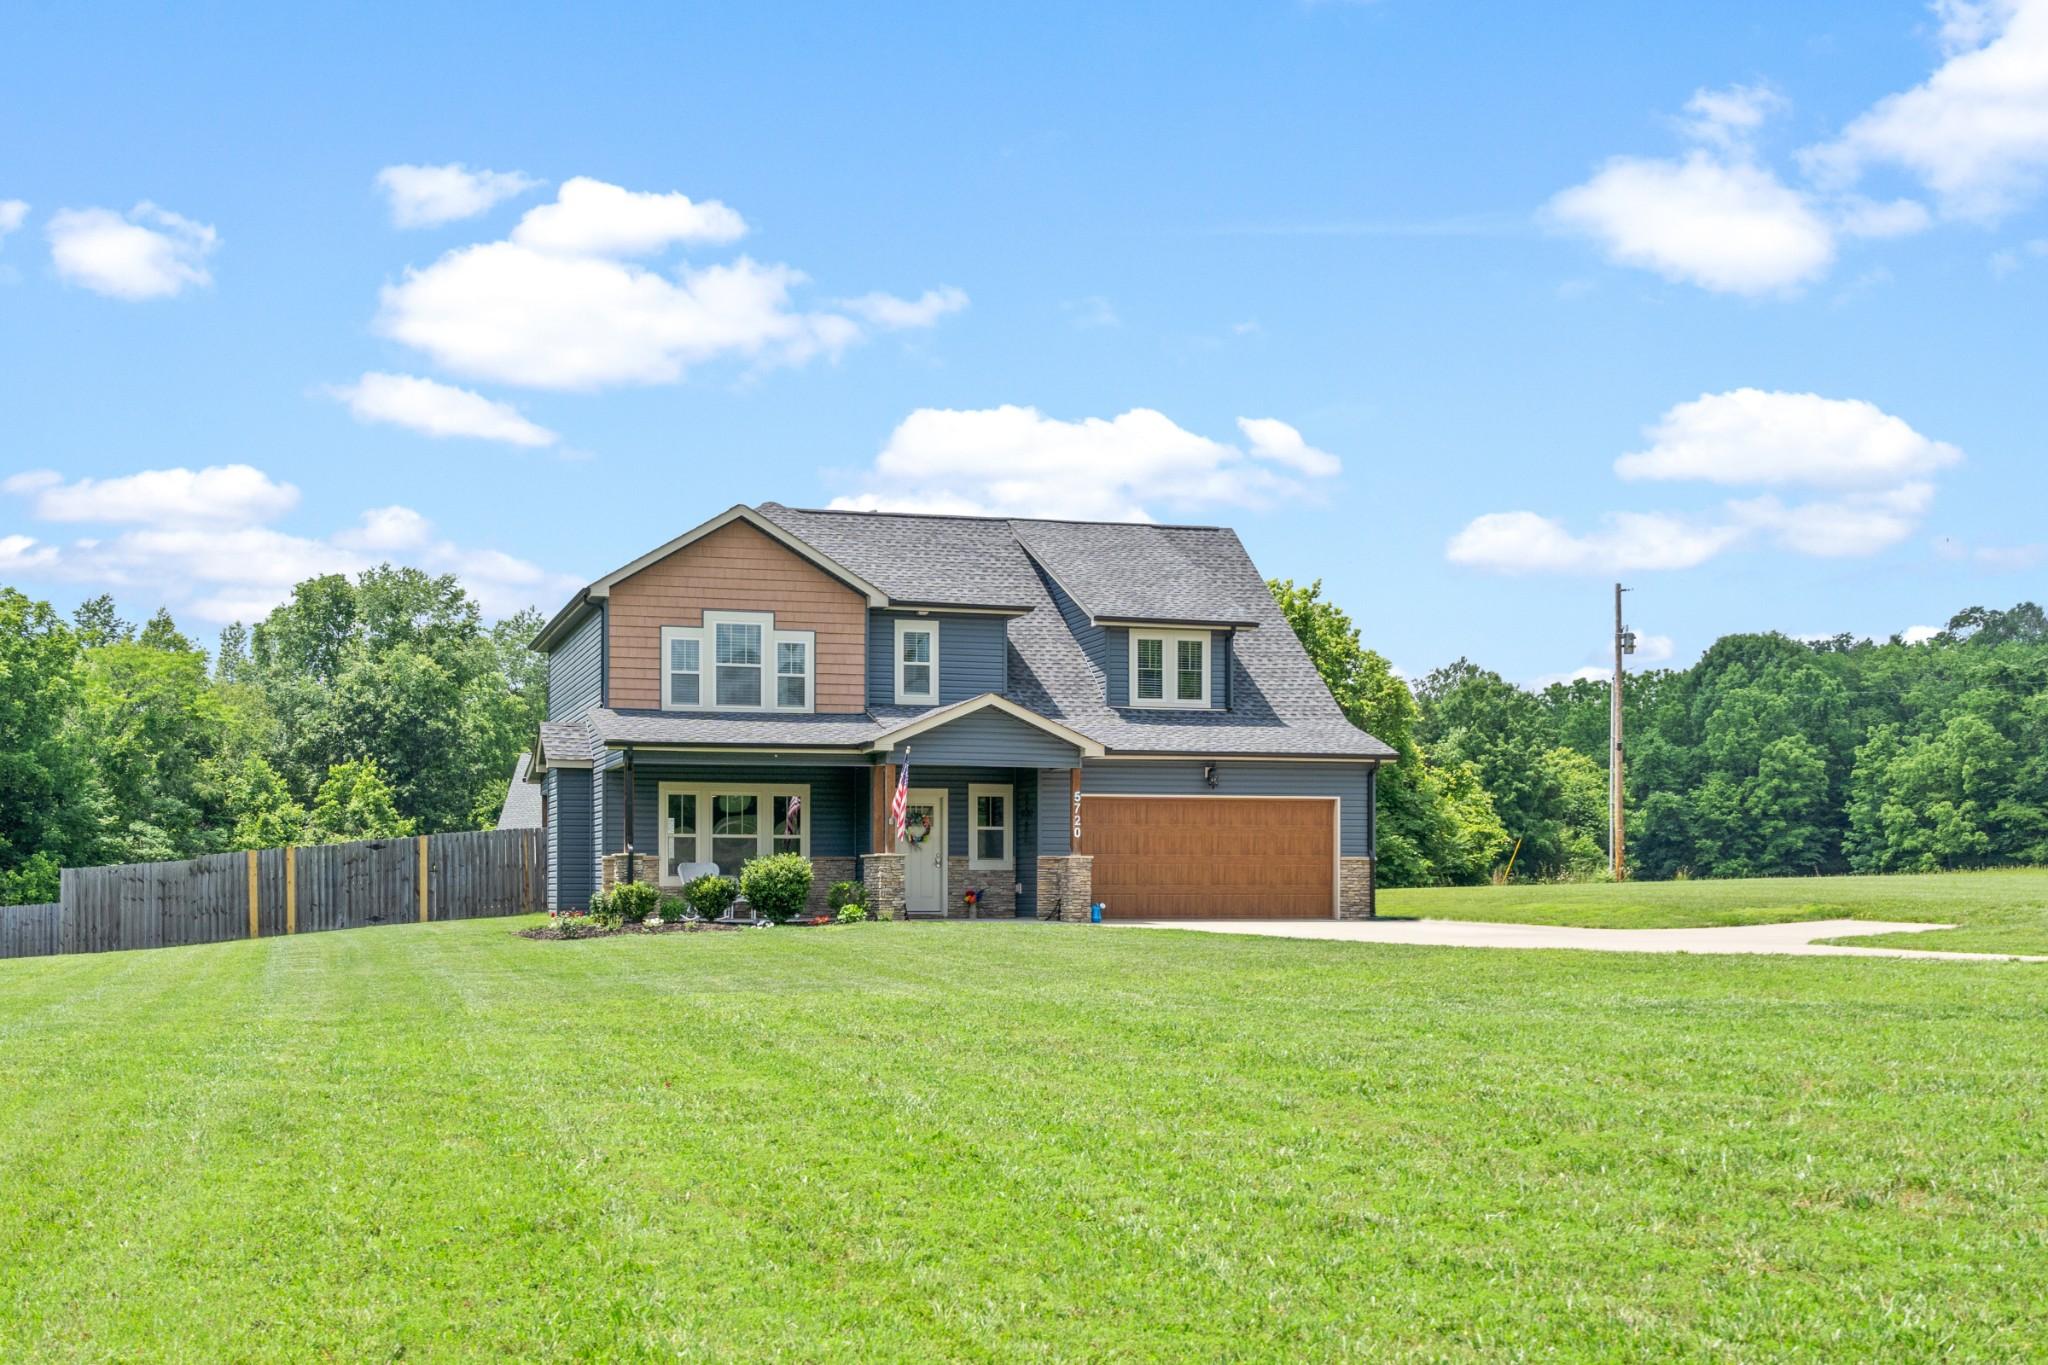 5720 Highway 48, N, Cumberland Furnace, TN 37051 - Cumberland Furnace, TN real estate listing